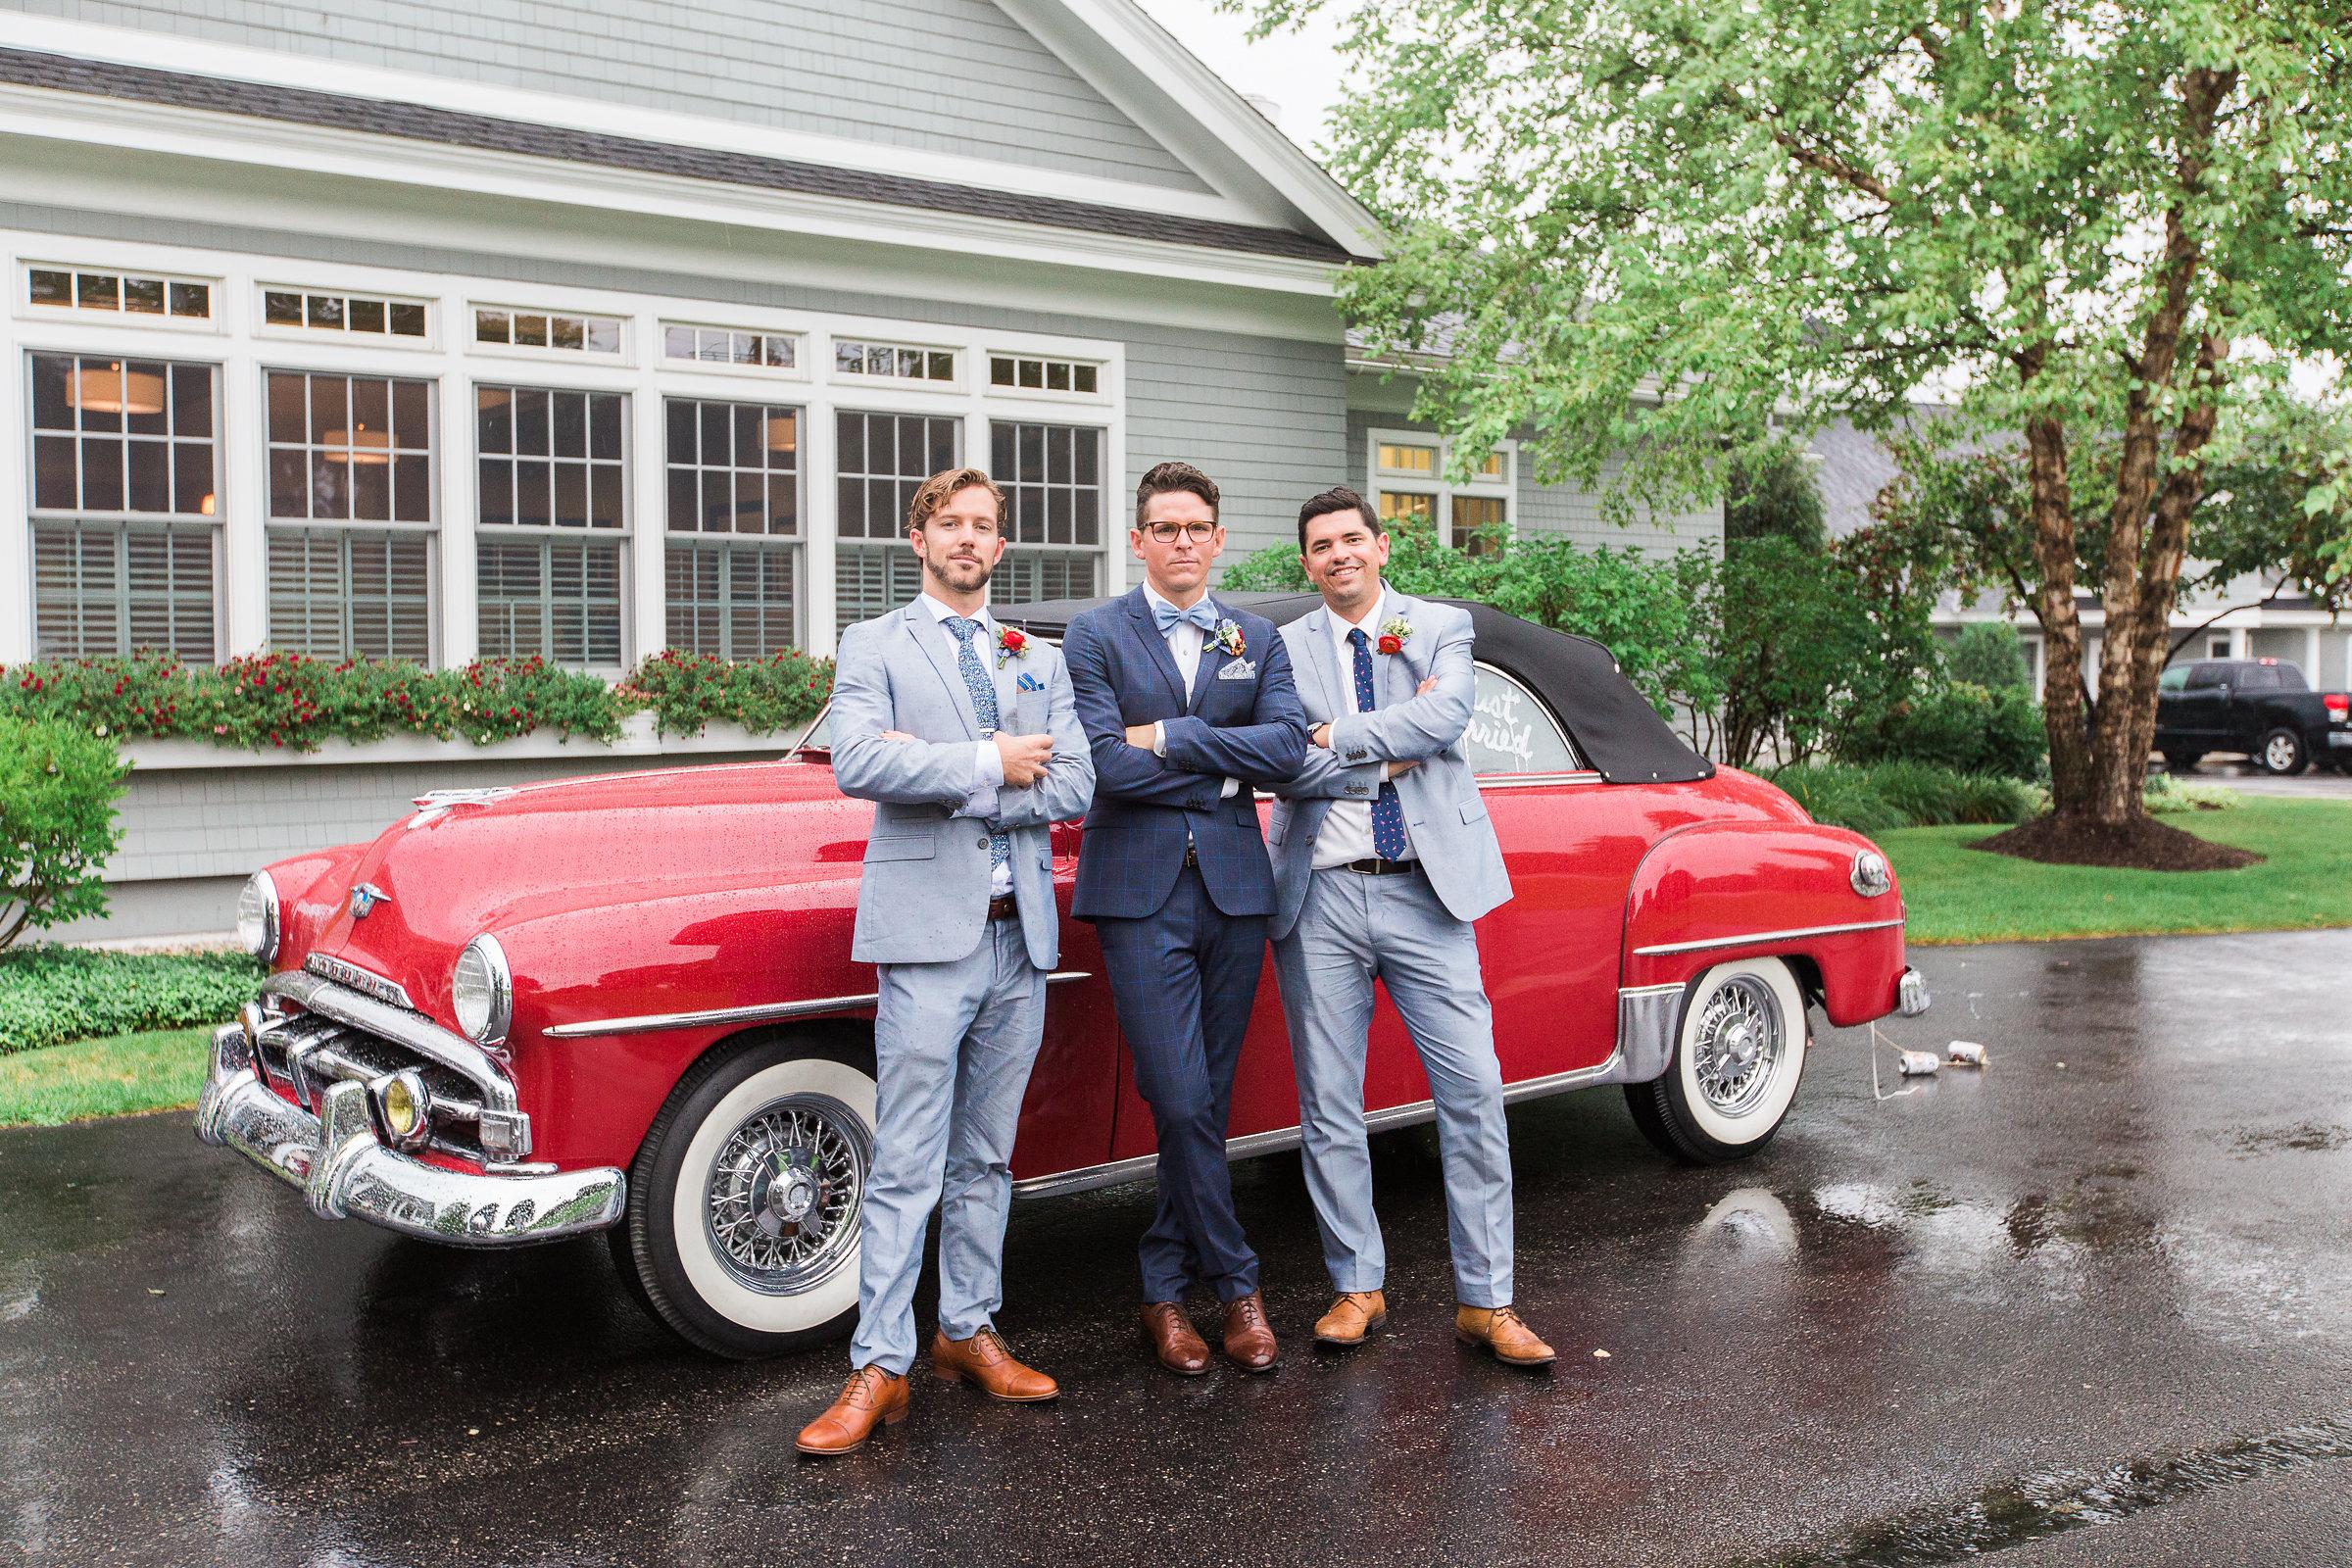 groomsmen posing in front of red car